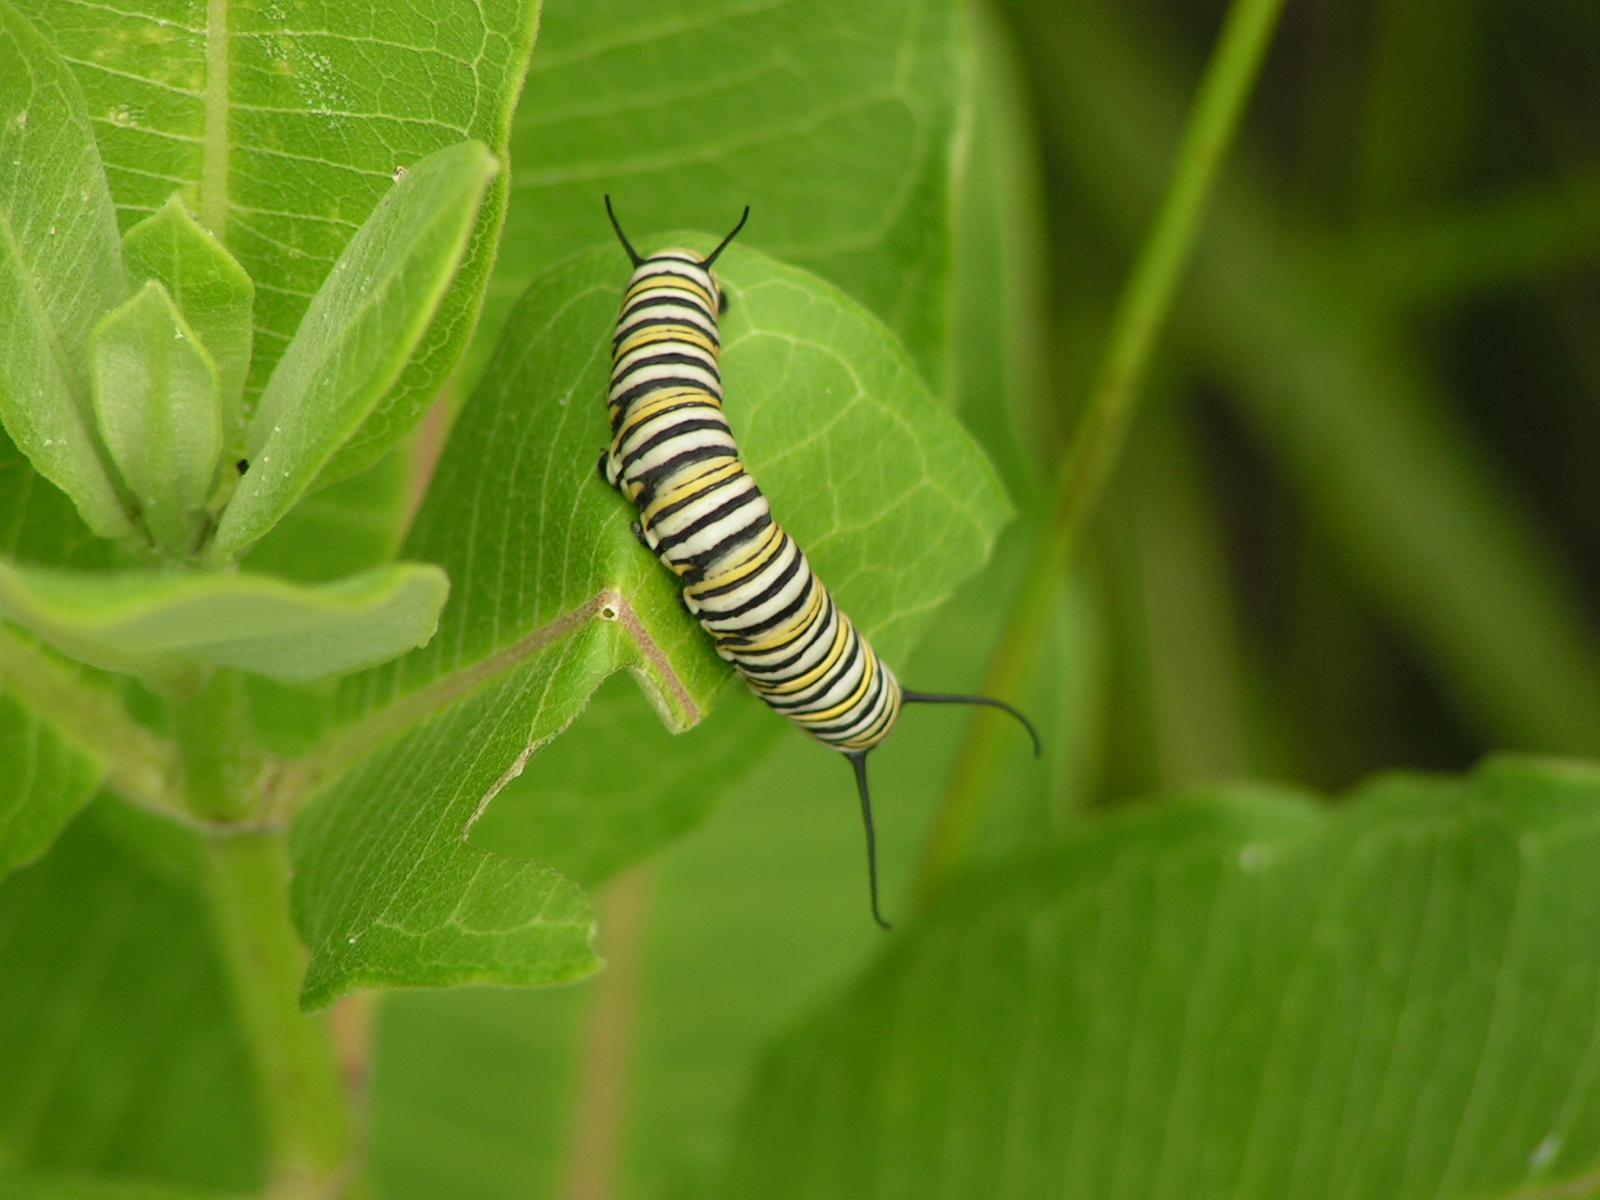 Sessle the caterpillar : Ysabetwordsmith fieldhaven fruit flower report